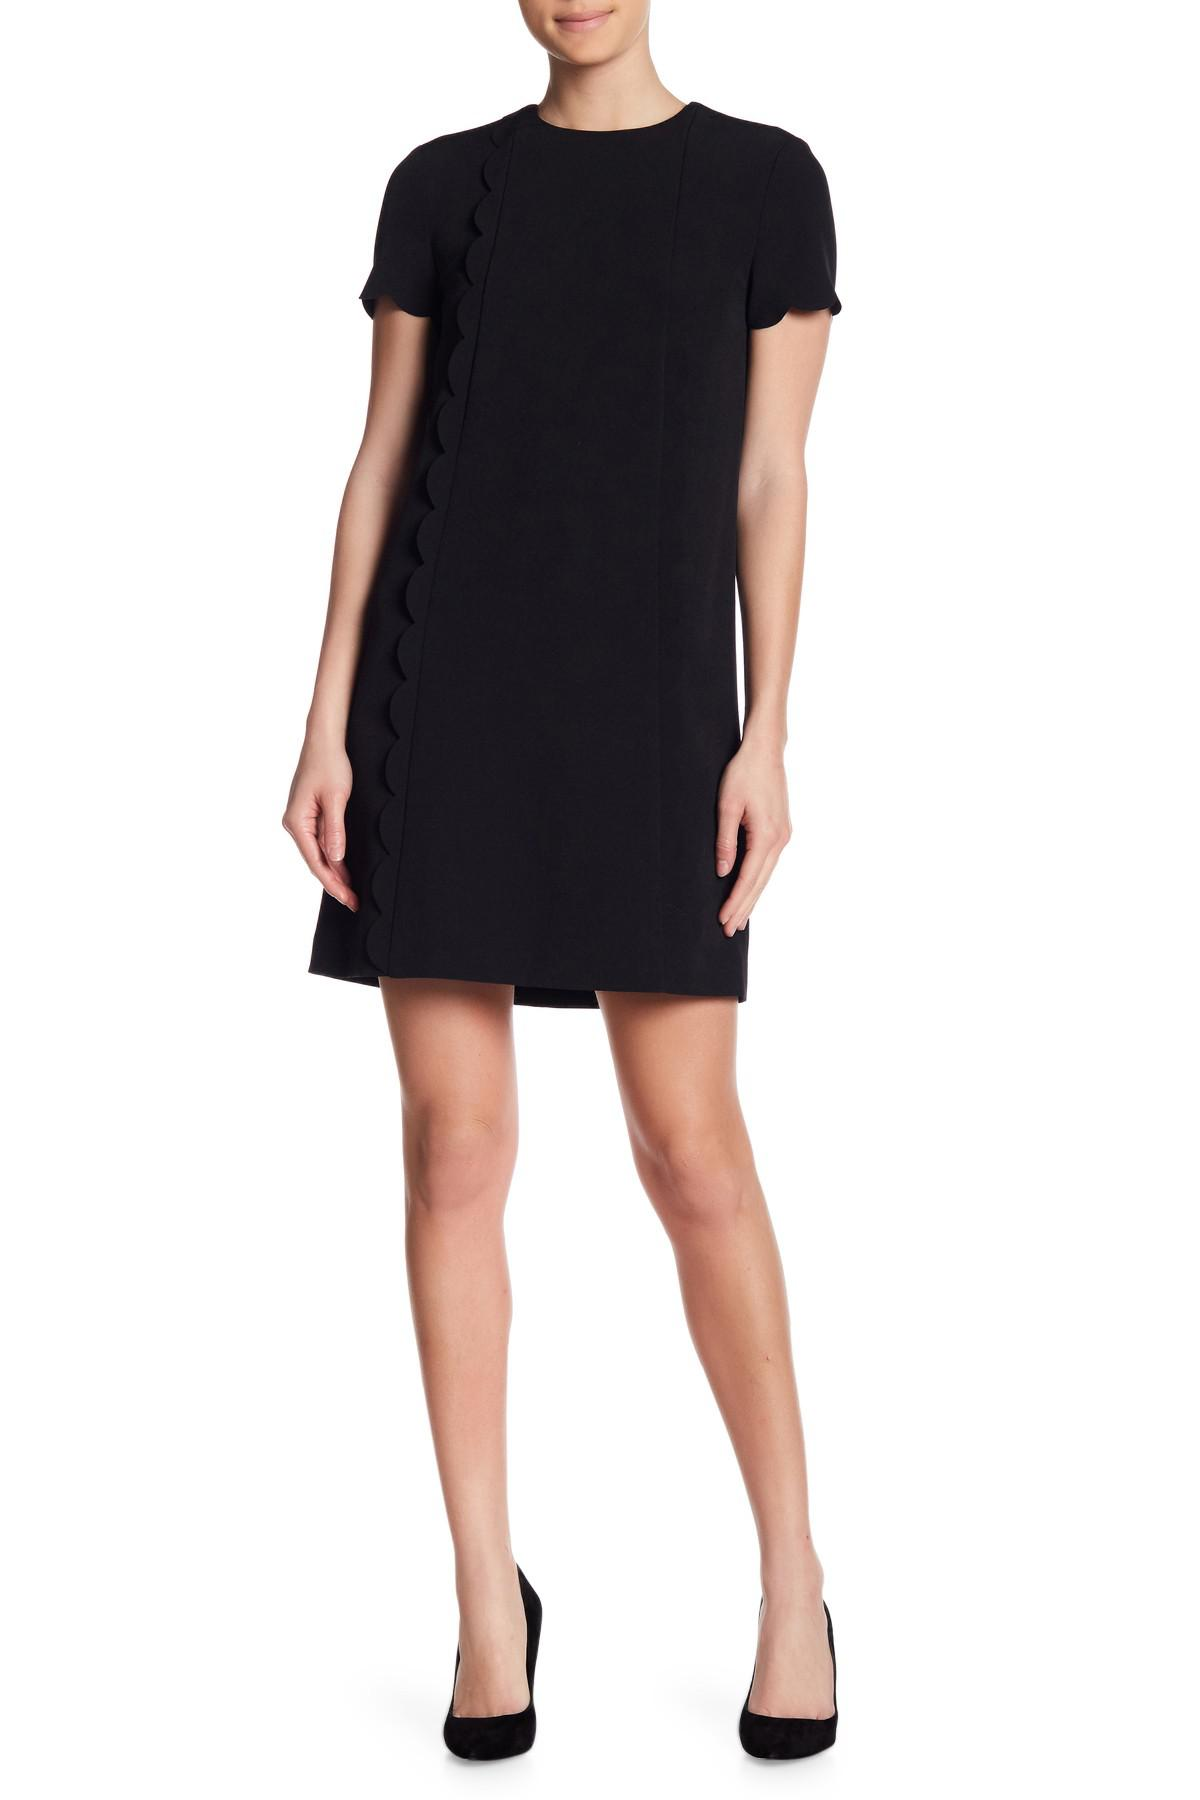 7bbd017279ef1 Tahari Scalloped Short Sleeve Shift Dress in Black - Lyst